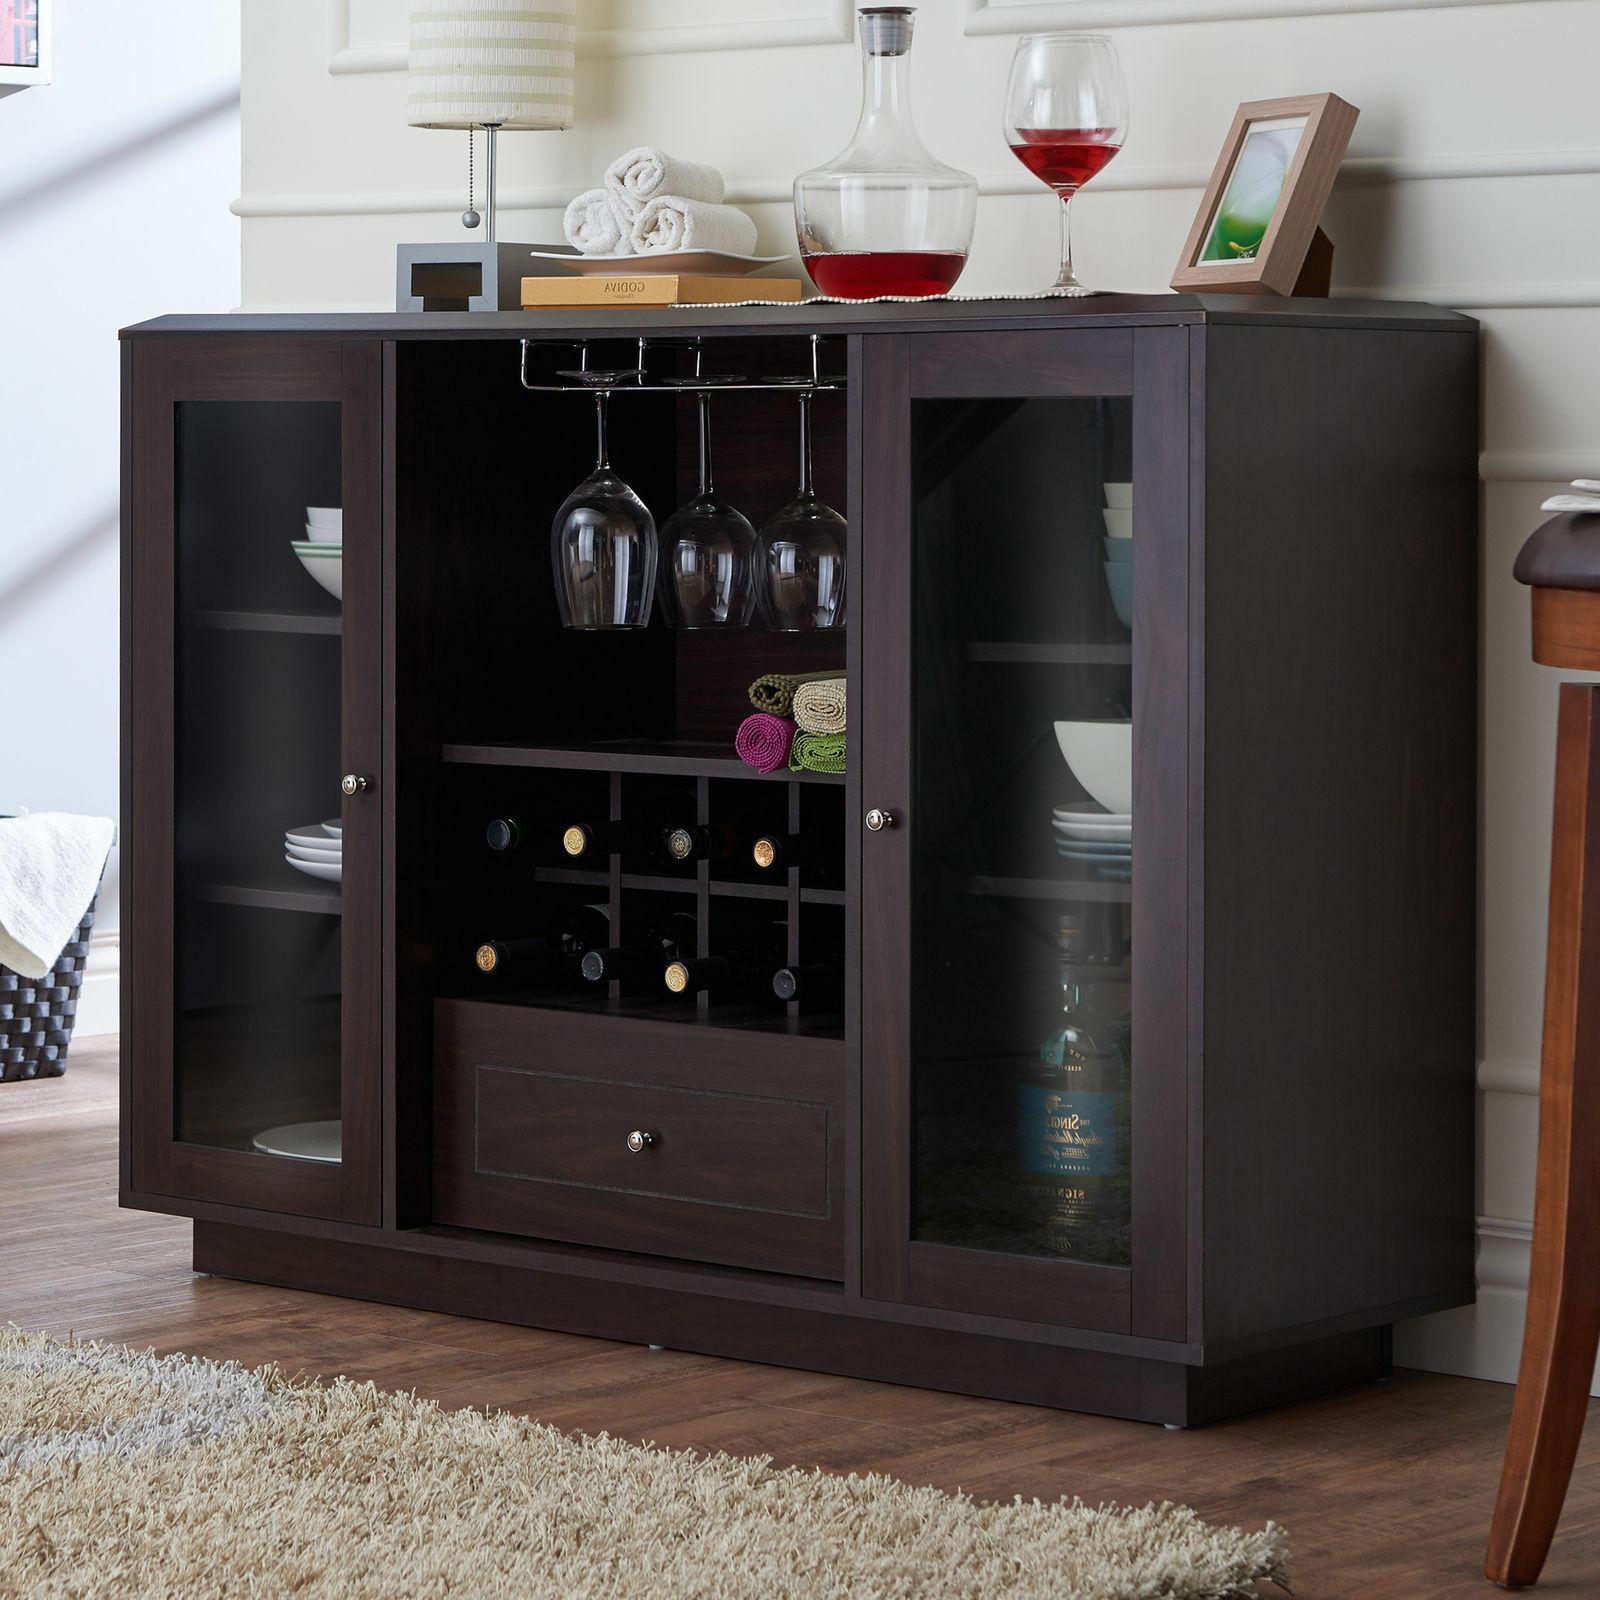 Modern Glass Doors Wine Rack Storage Buffet Dining Room Cabinet Espresso Finish Regarding Modern Espresso Storage Buffets (View 14 of 20)